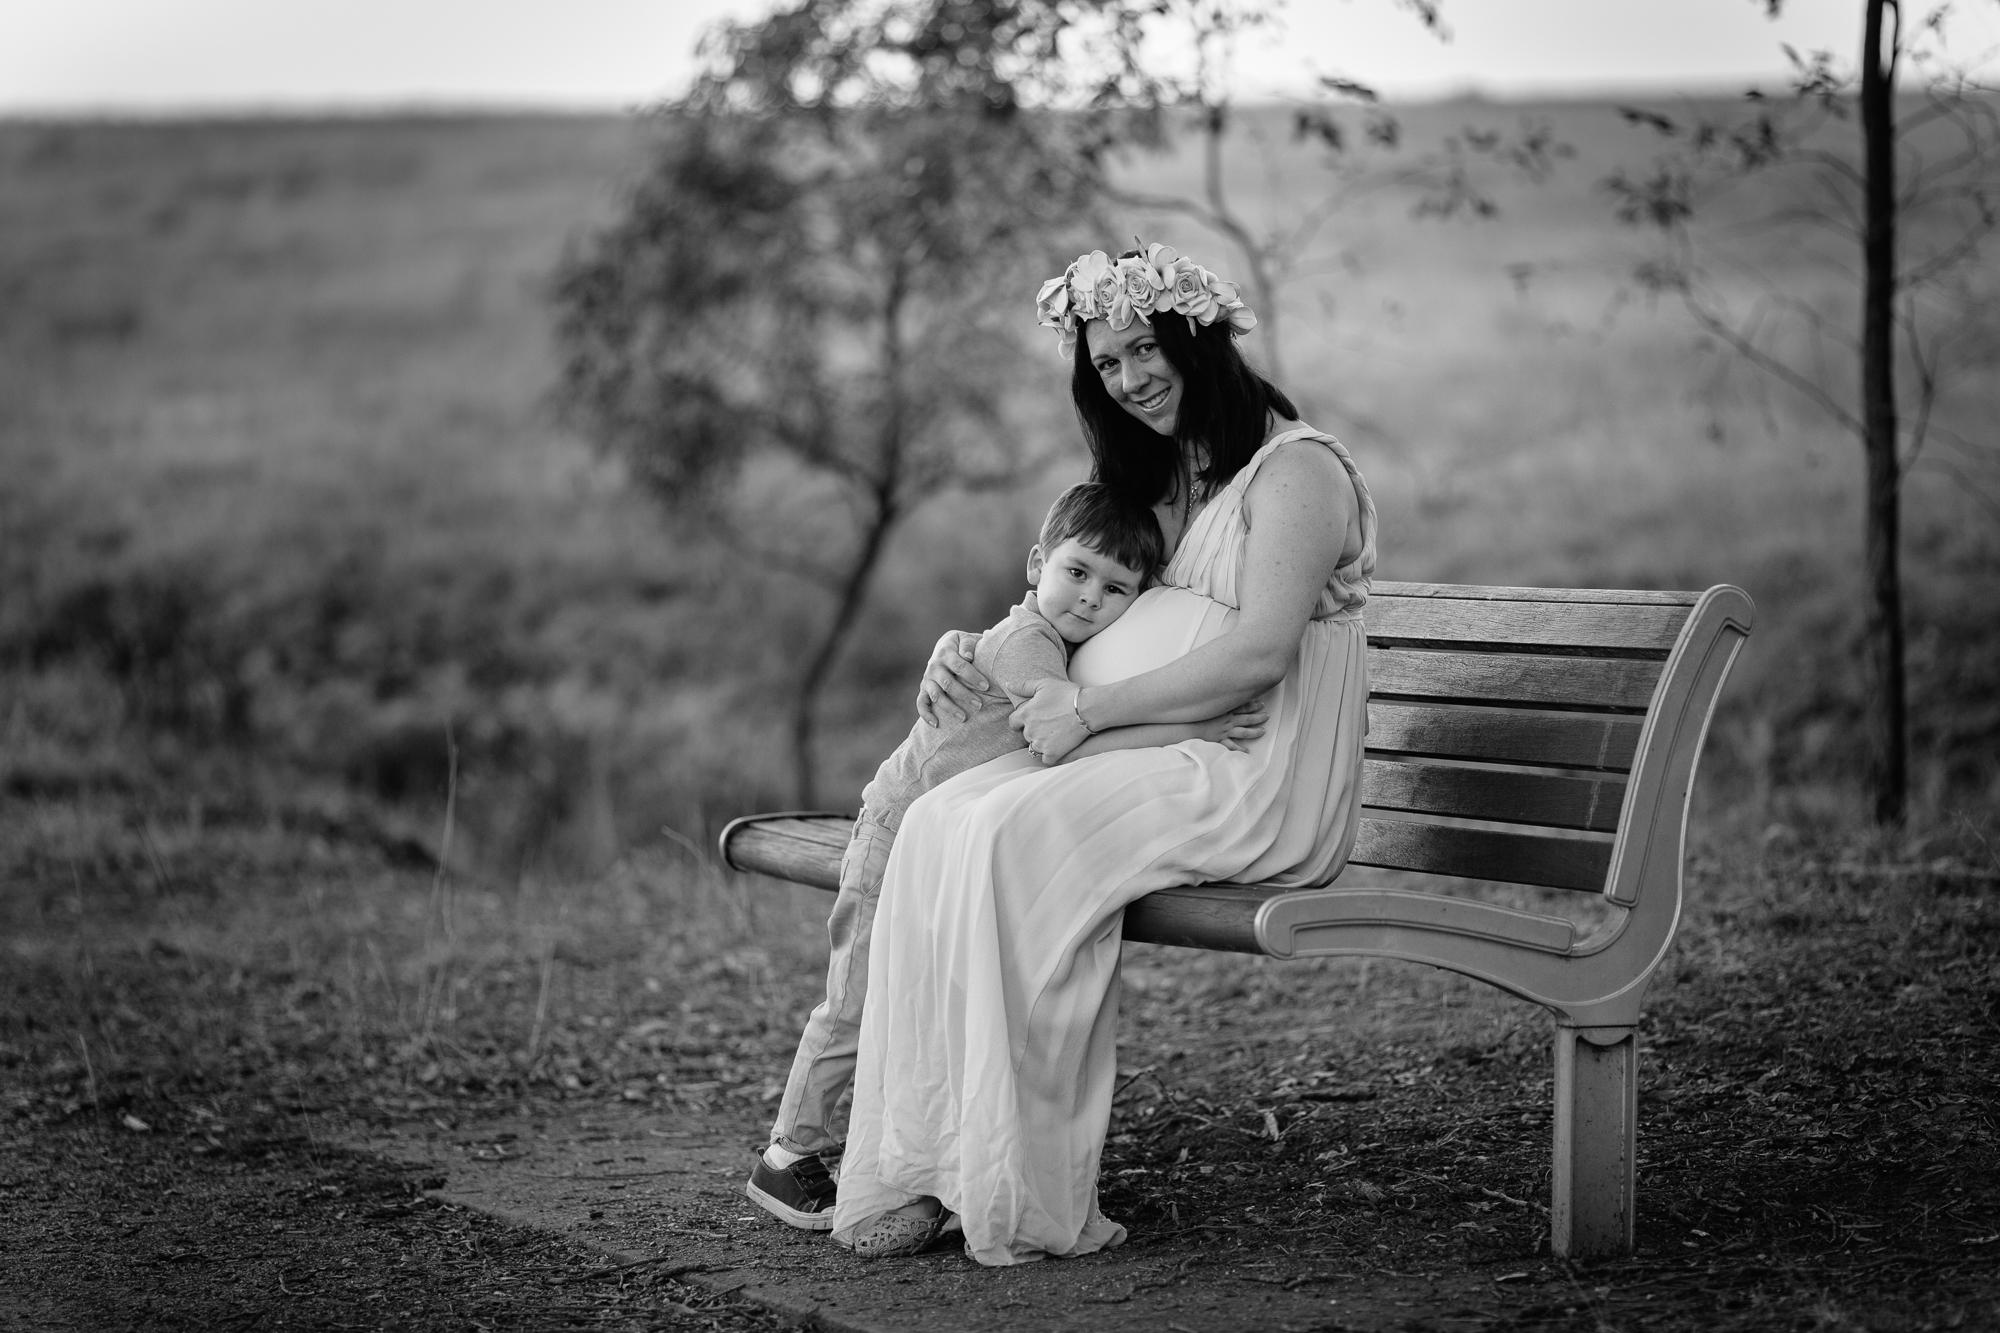 112_Maternity Lifetsyle_Shelley_Sunlight Photography.JPG